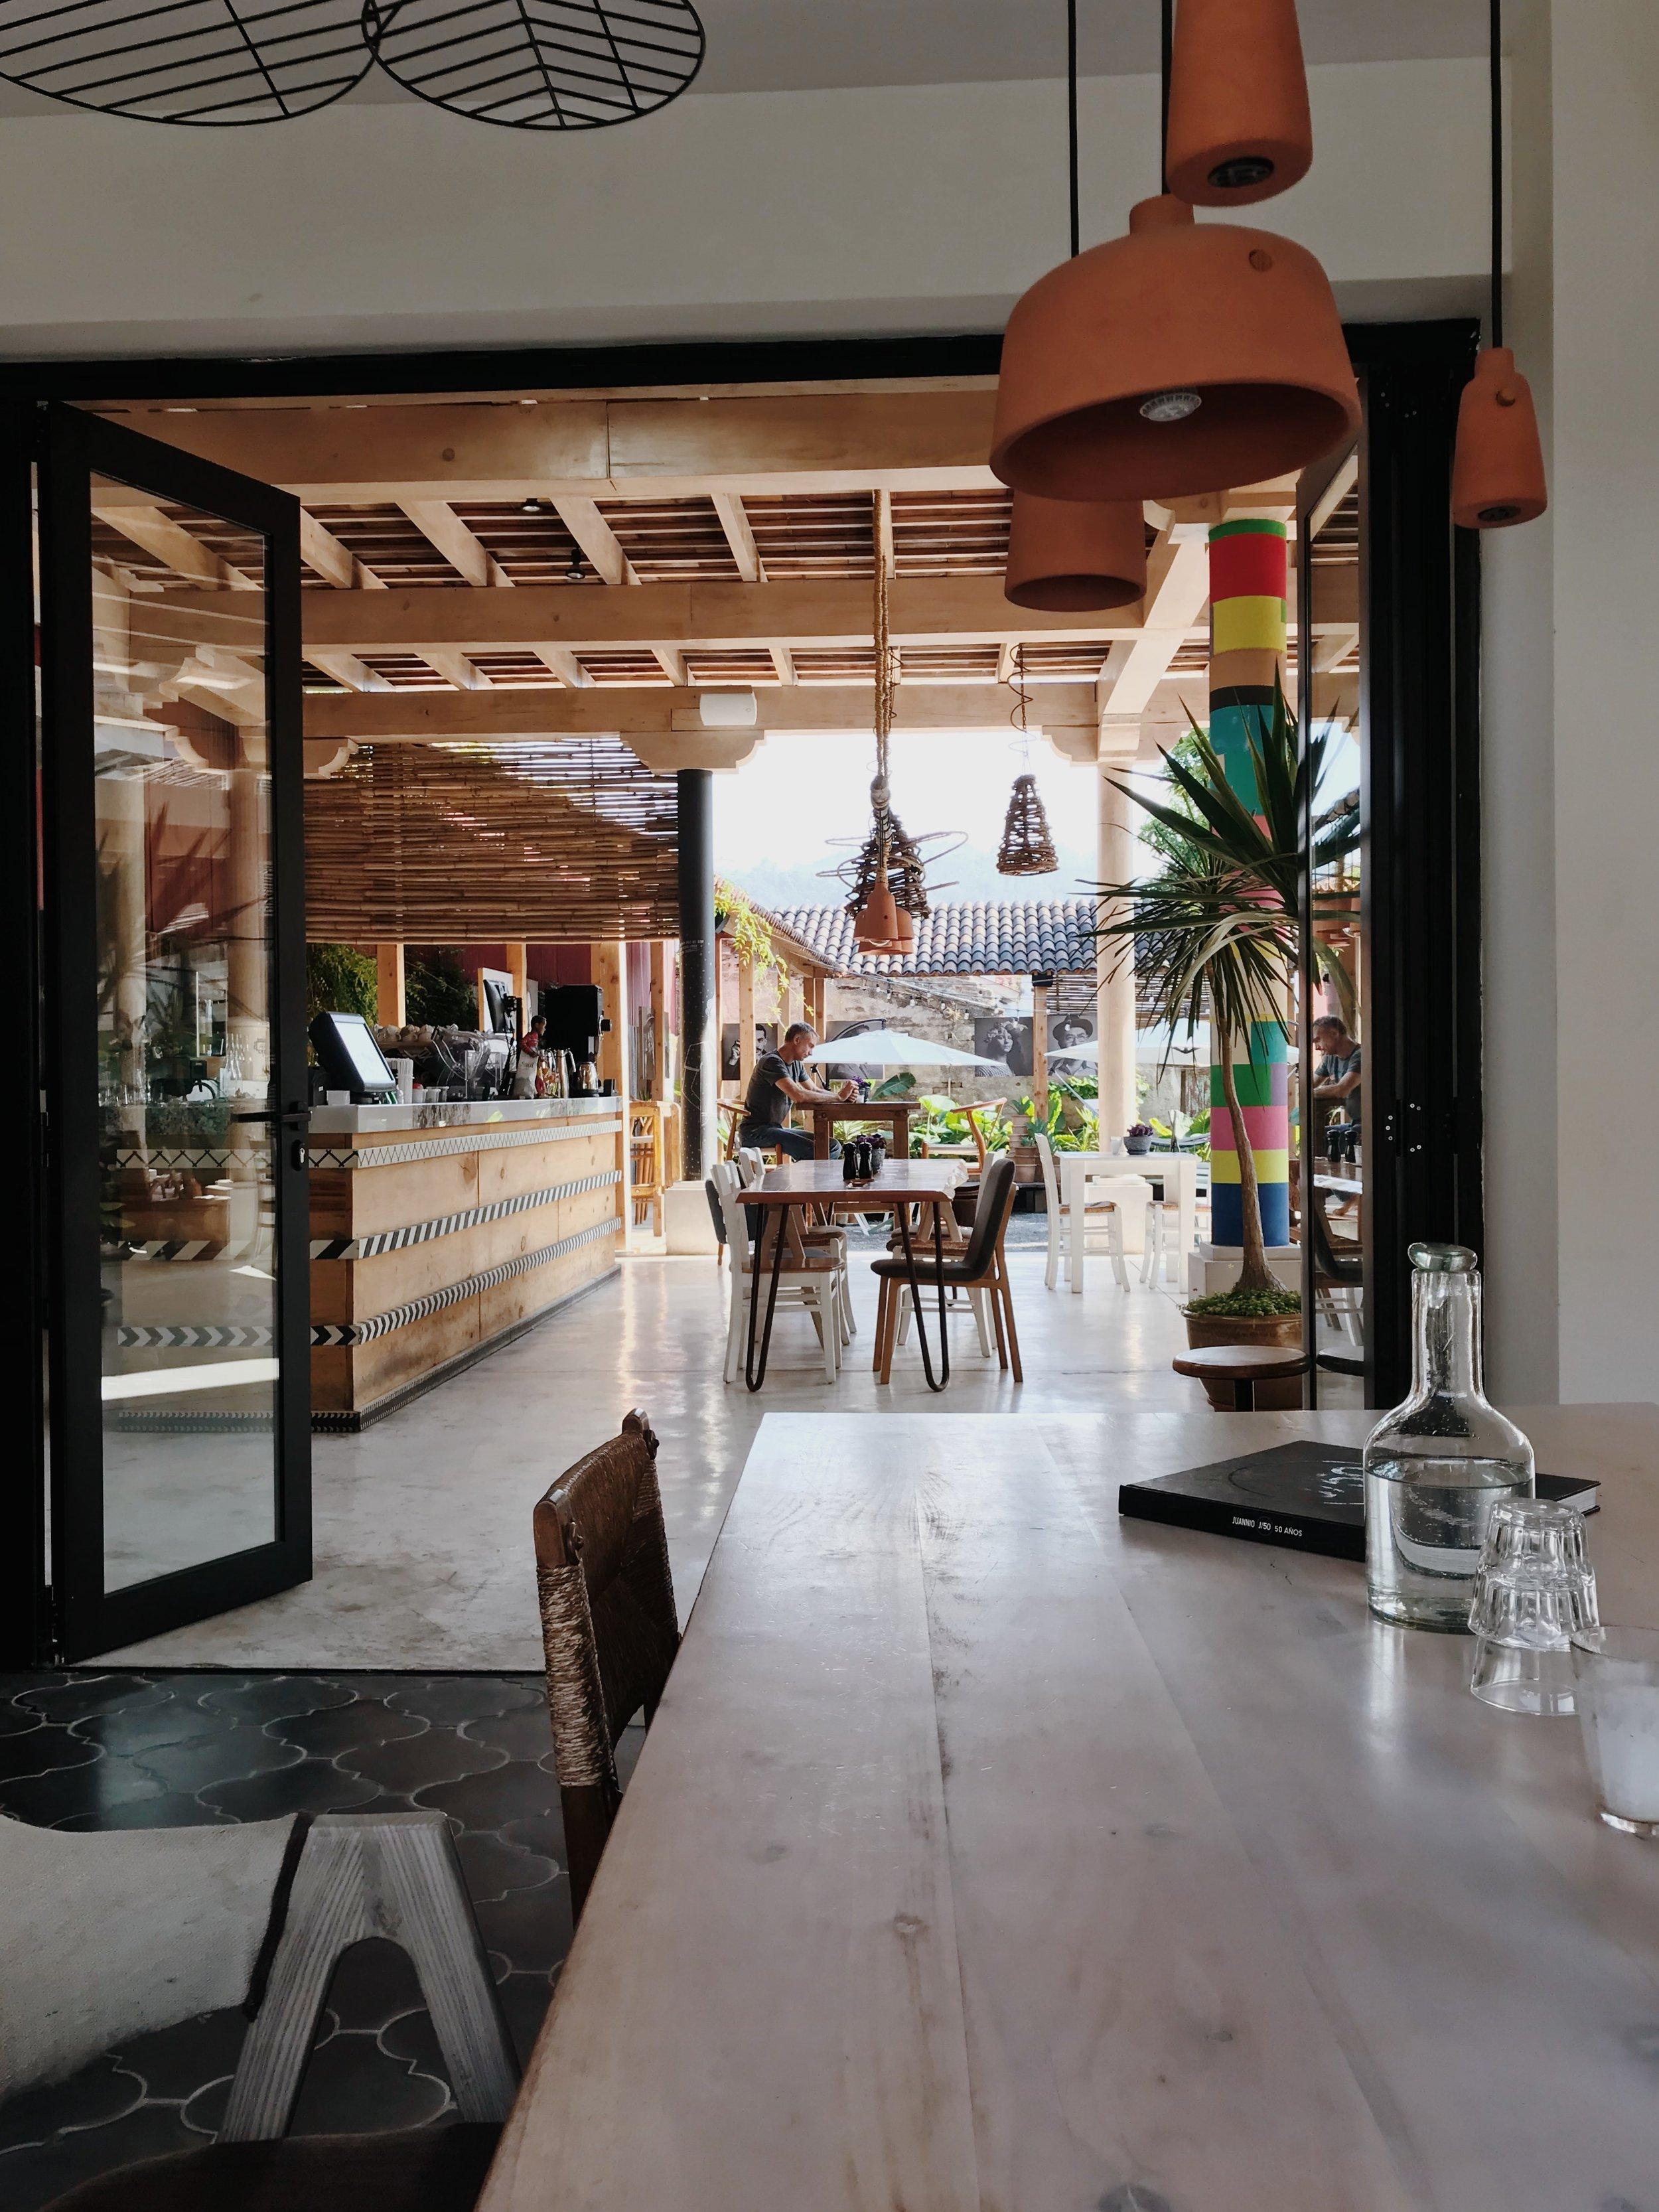 Where to Stay in Antigua Guatemala